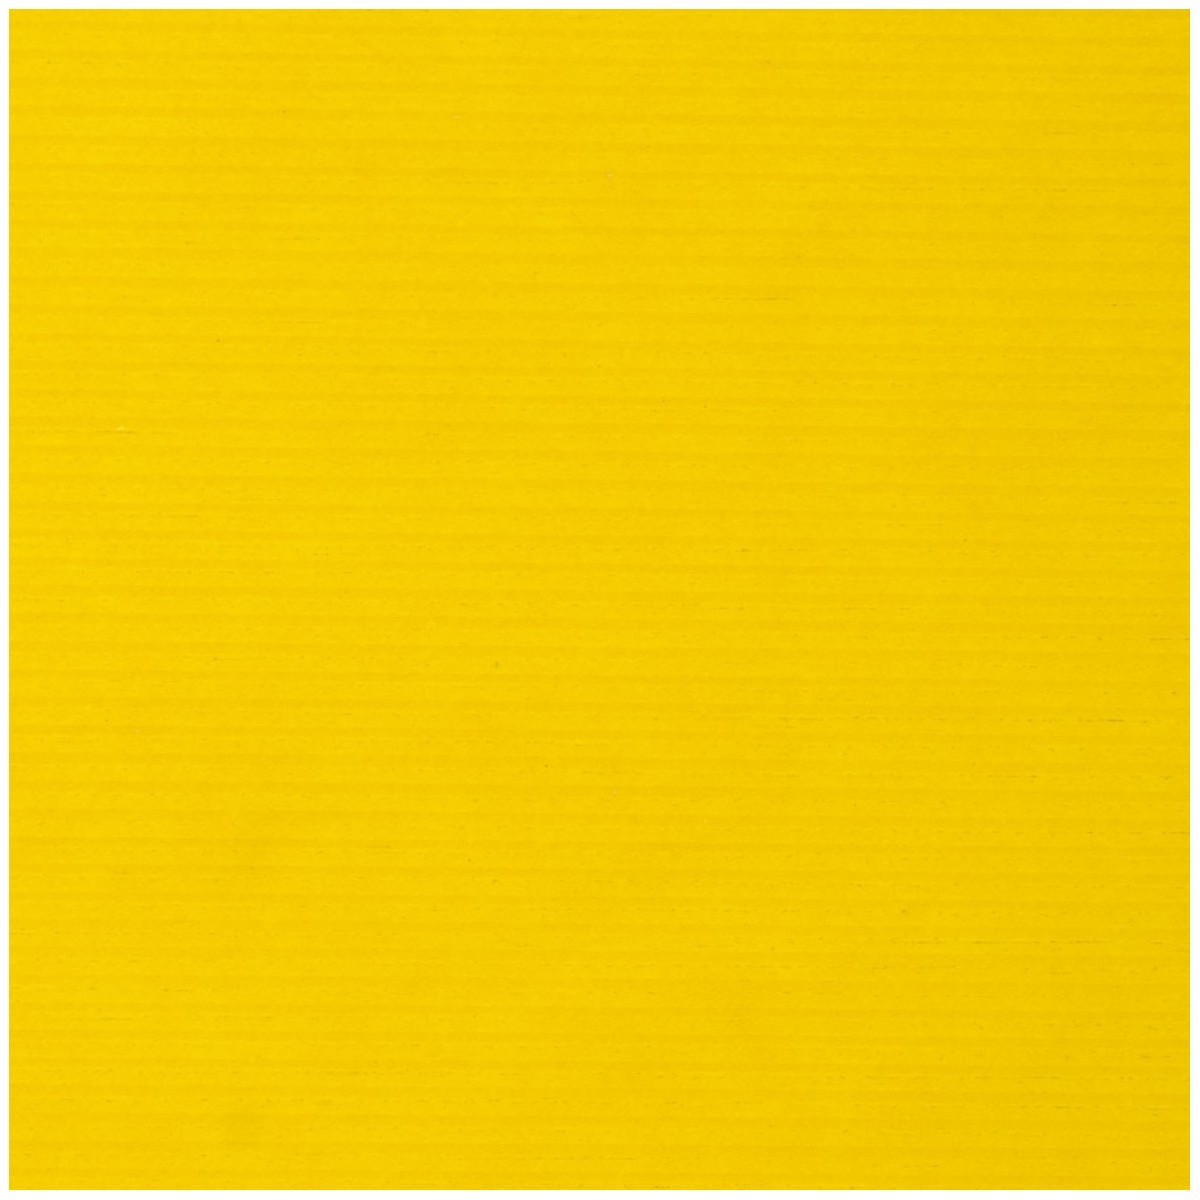 Carta Sealing Bianco ECOWHITE Gr.60 Fogli Cm.70x100 Colori Tinta Unita (al Kg.) Giallo